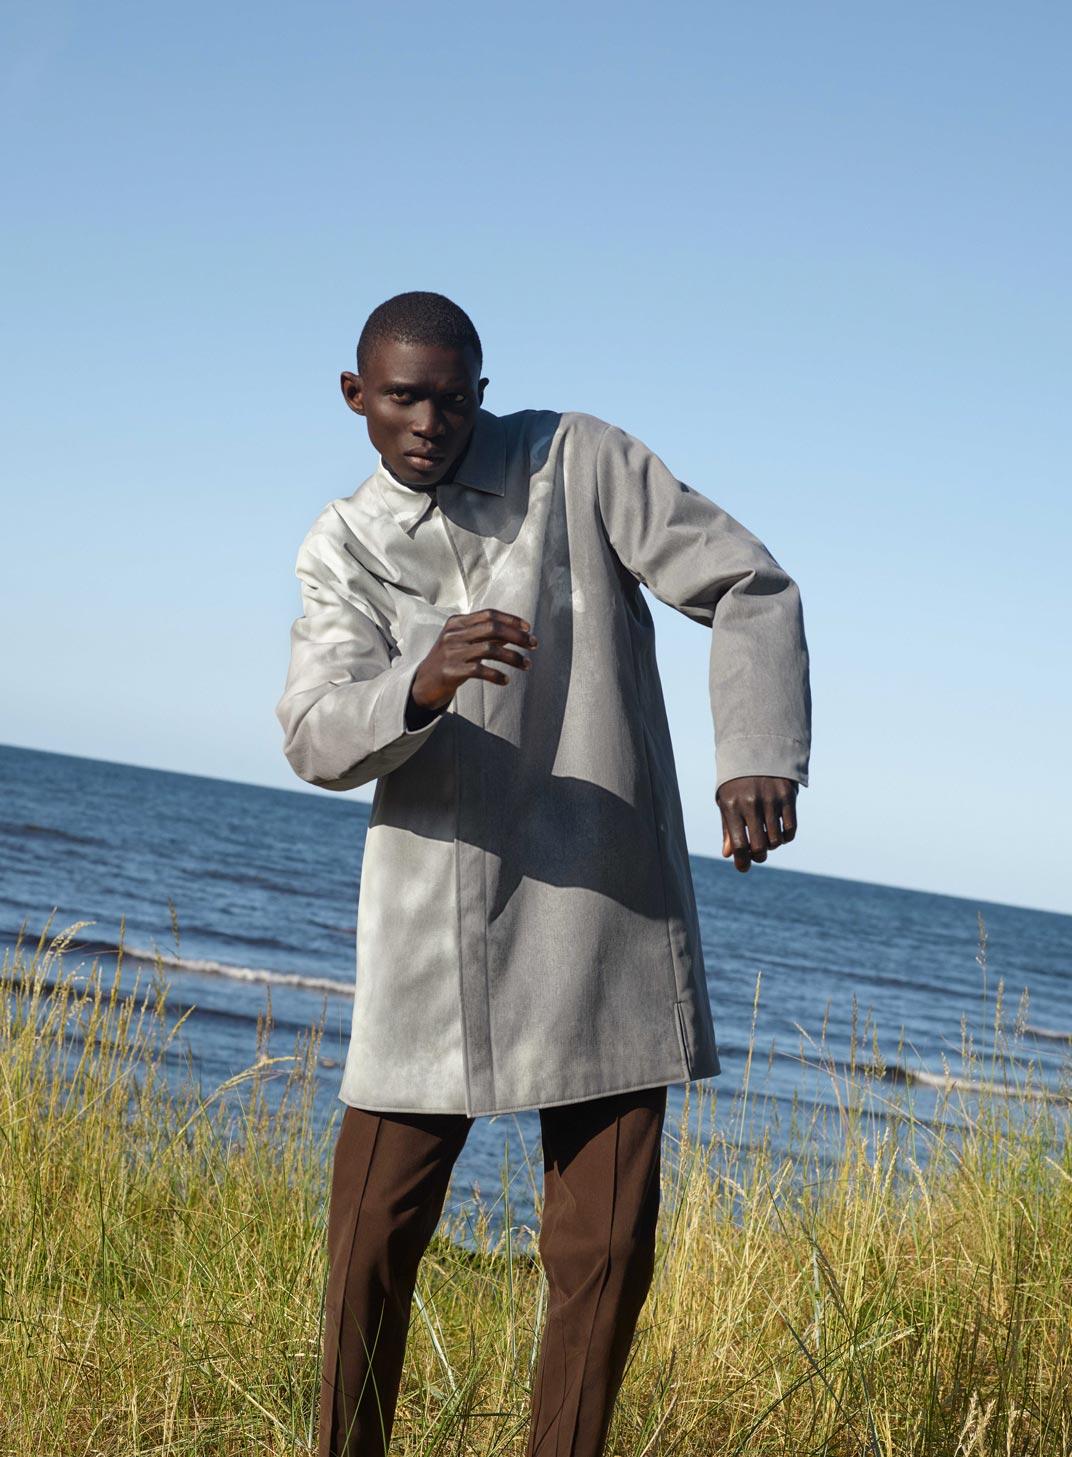 LE-MILE-Magazine-LE-MILE-Studios-COS-AW18-Menswear-Campaign-(10).jpg